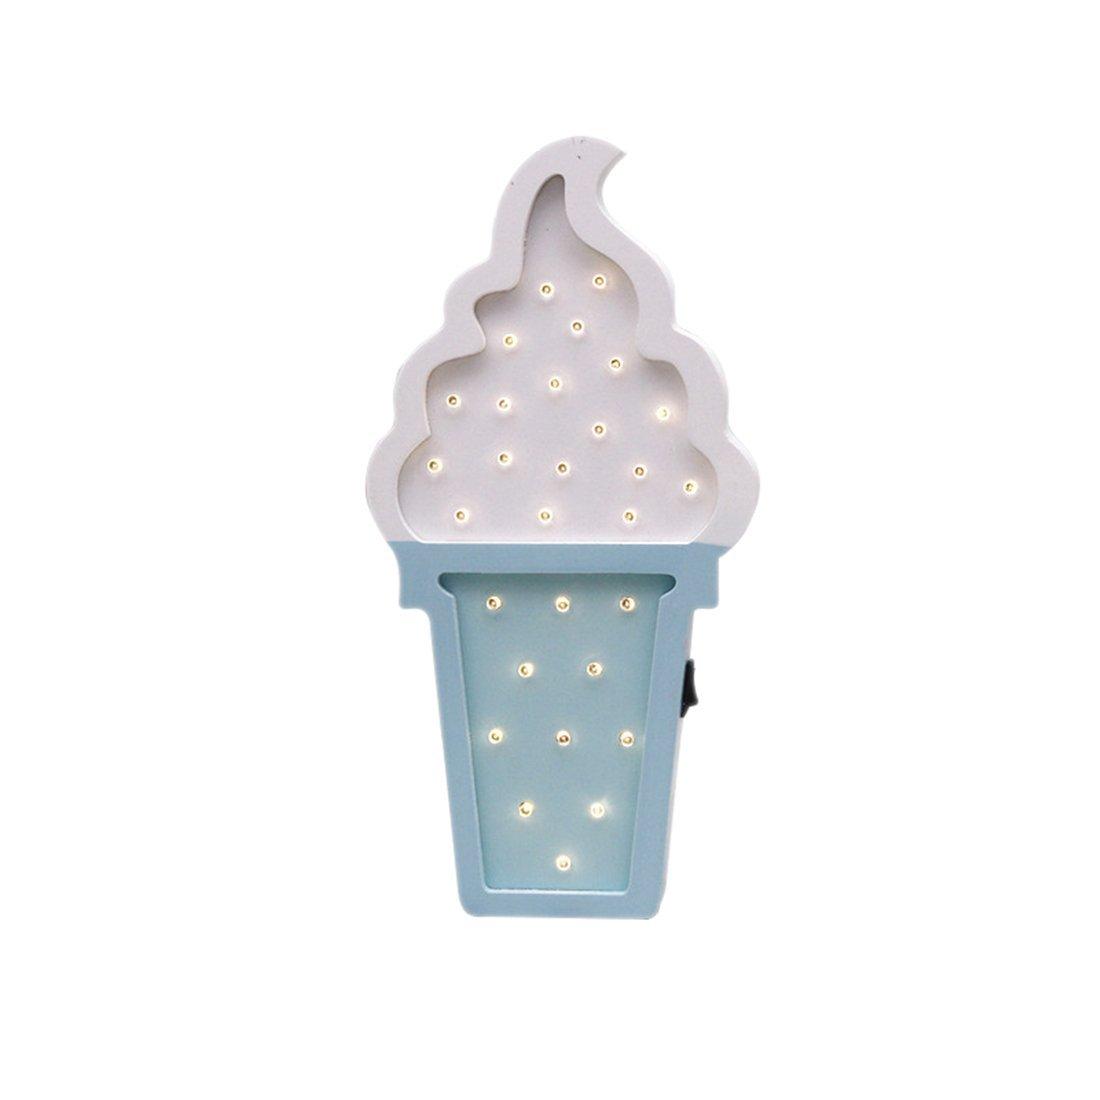 SODIAL カートゥーン ホワイト ブルー 北欧スタイル ナイトライト 写真小道具 アイスクリーム型 LED 木製 カートゥーン ナイトライト 壁掛け装飾ランプ 子供部屋装飾 写真小道具 ホワイトブルー B07CSQSVFF, オオガキシ:80c6a6c5 --- ijpba.info